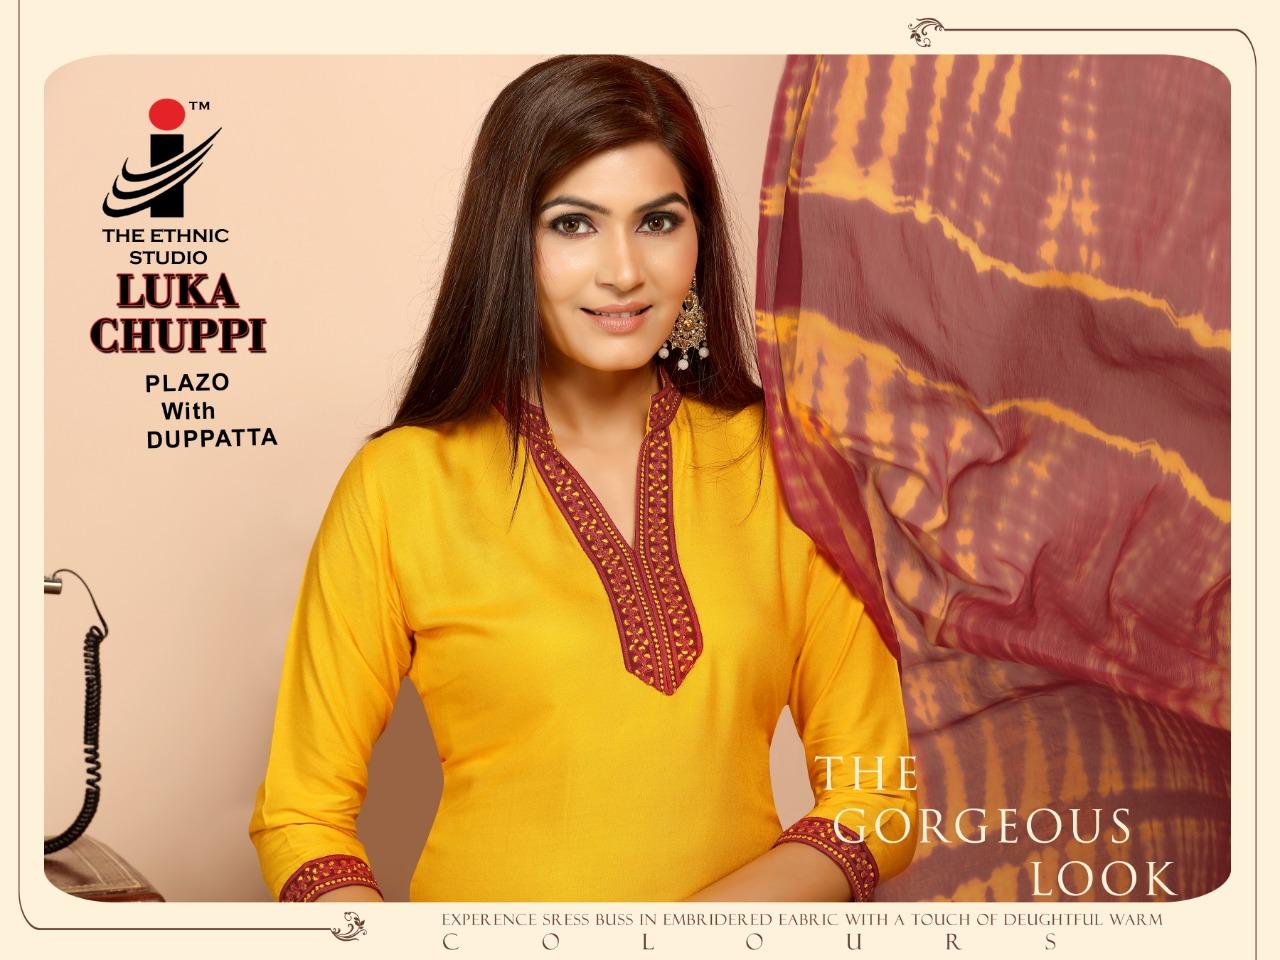 The ethnic studio lukka chuppi vol 2 rayon embroidered kurta plazzo with dupatta collection